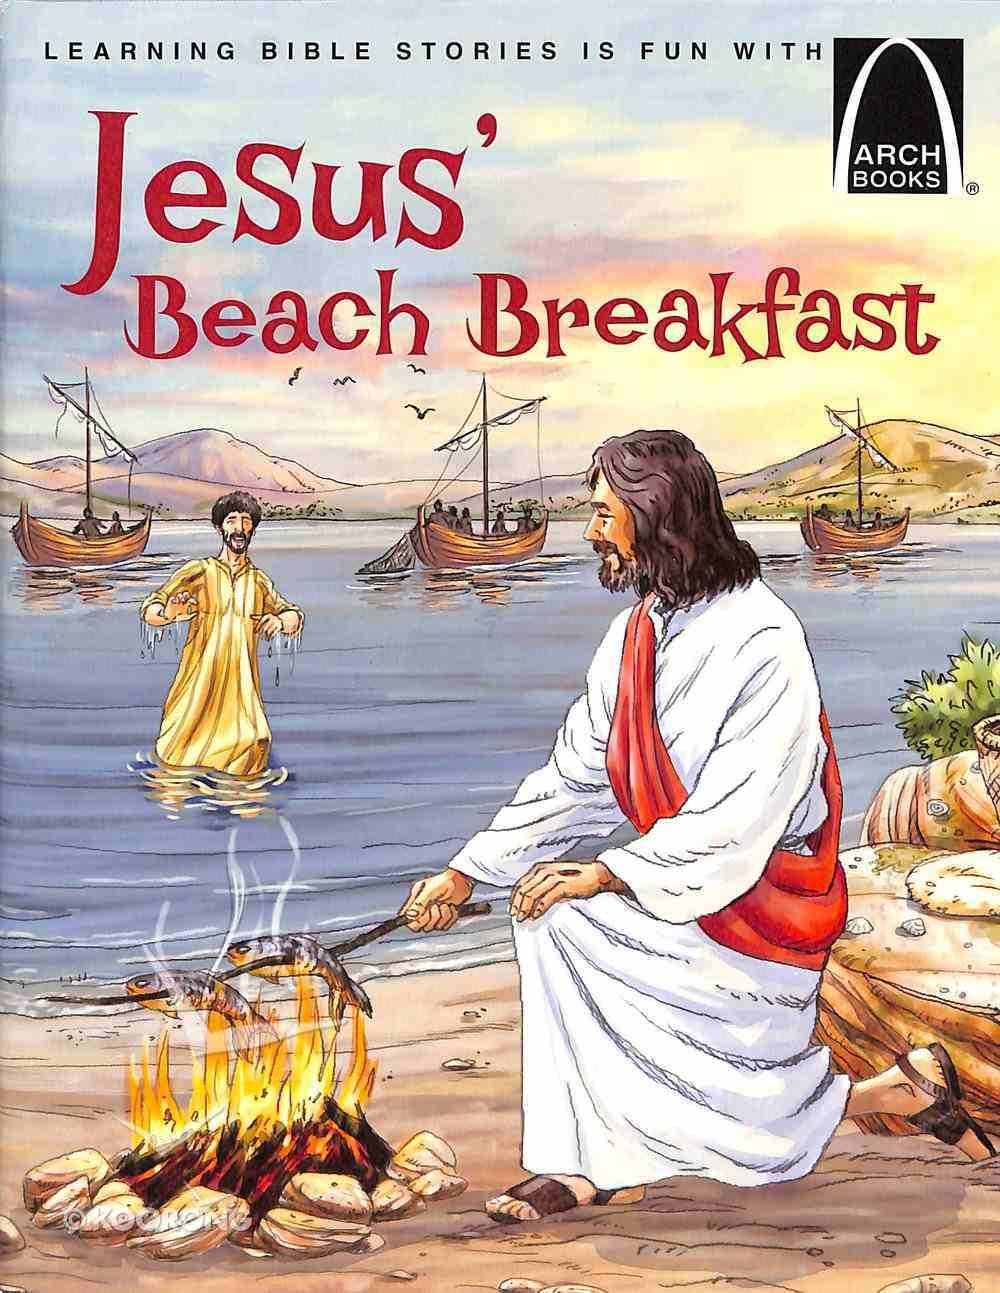 Jesus' Beach Breakfast (Arch Books Series) Paperback